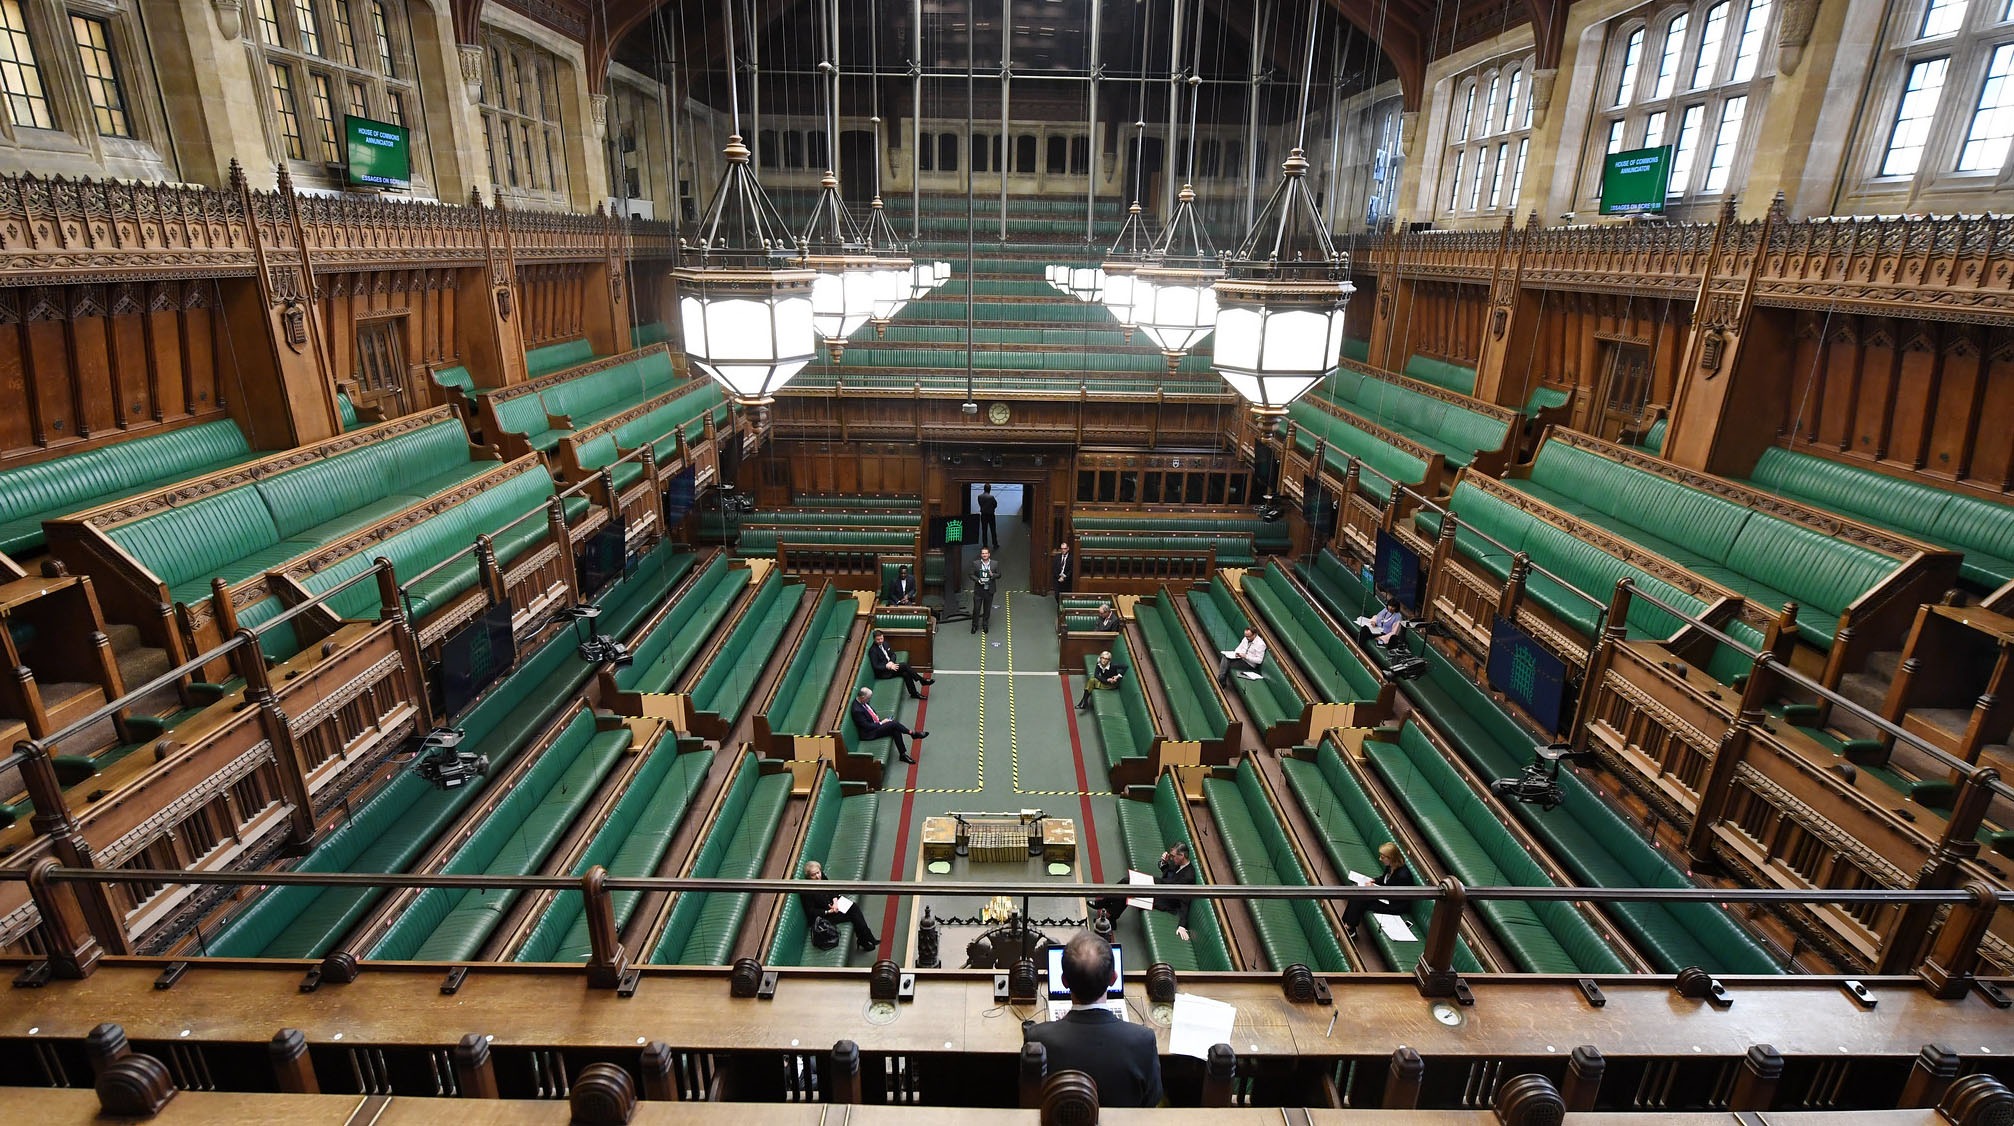 IMAGEM: 72% dos ingleses apoiam lockdown